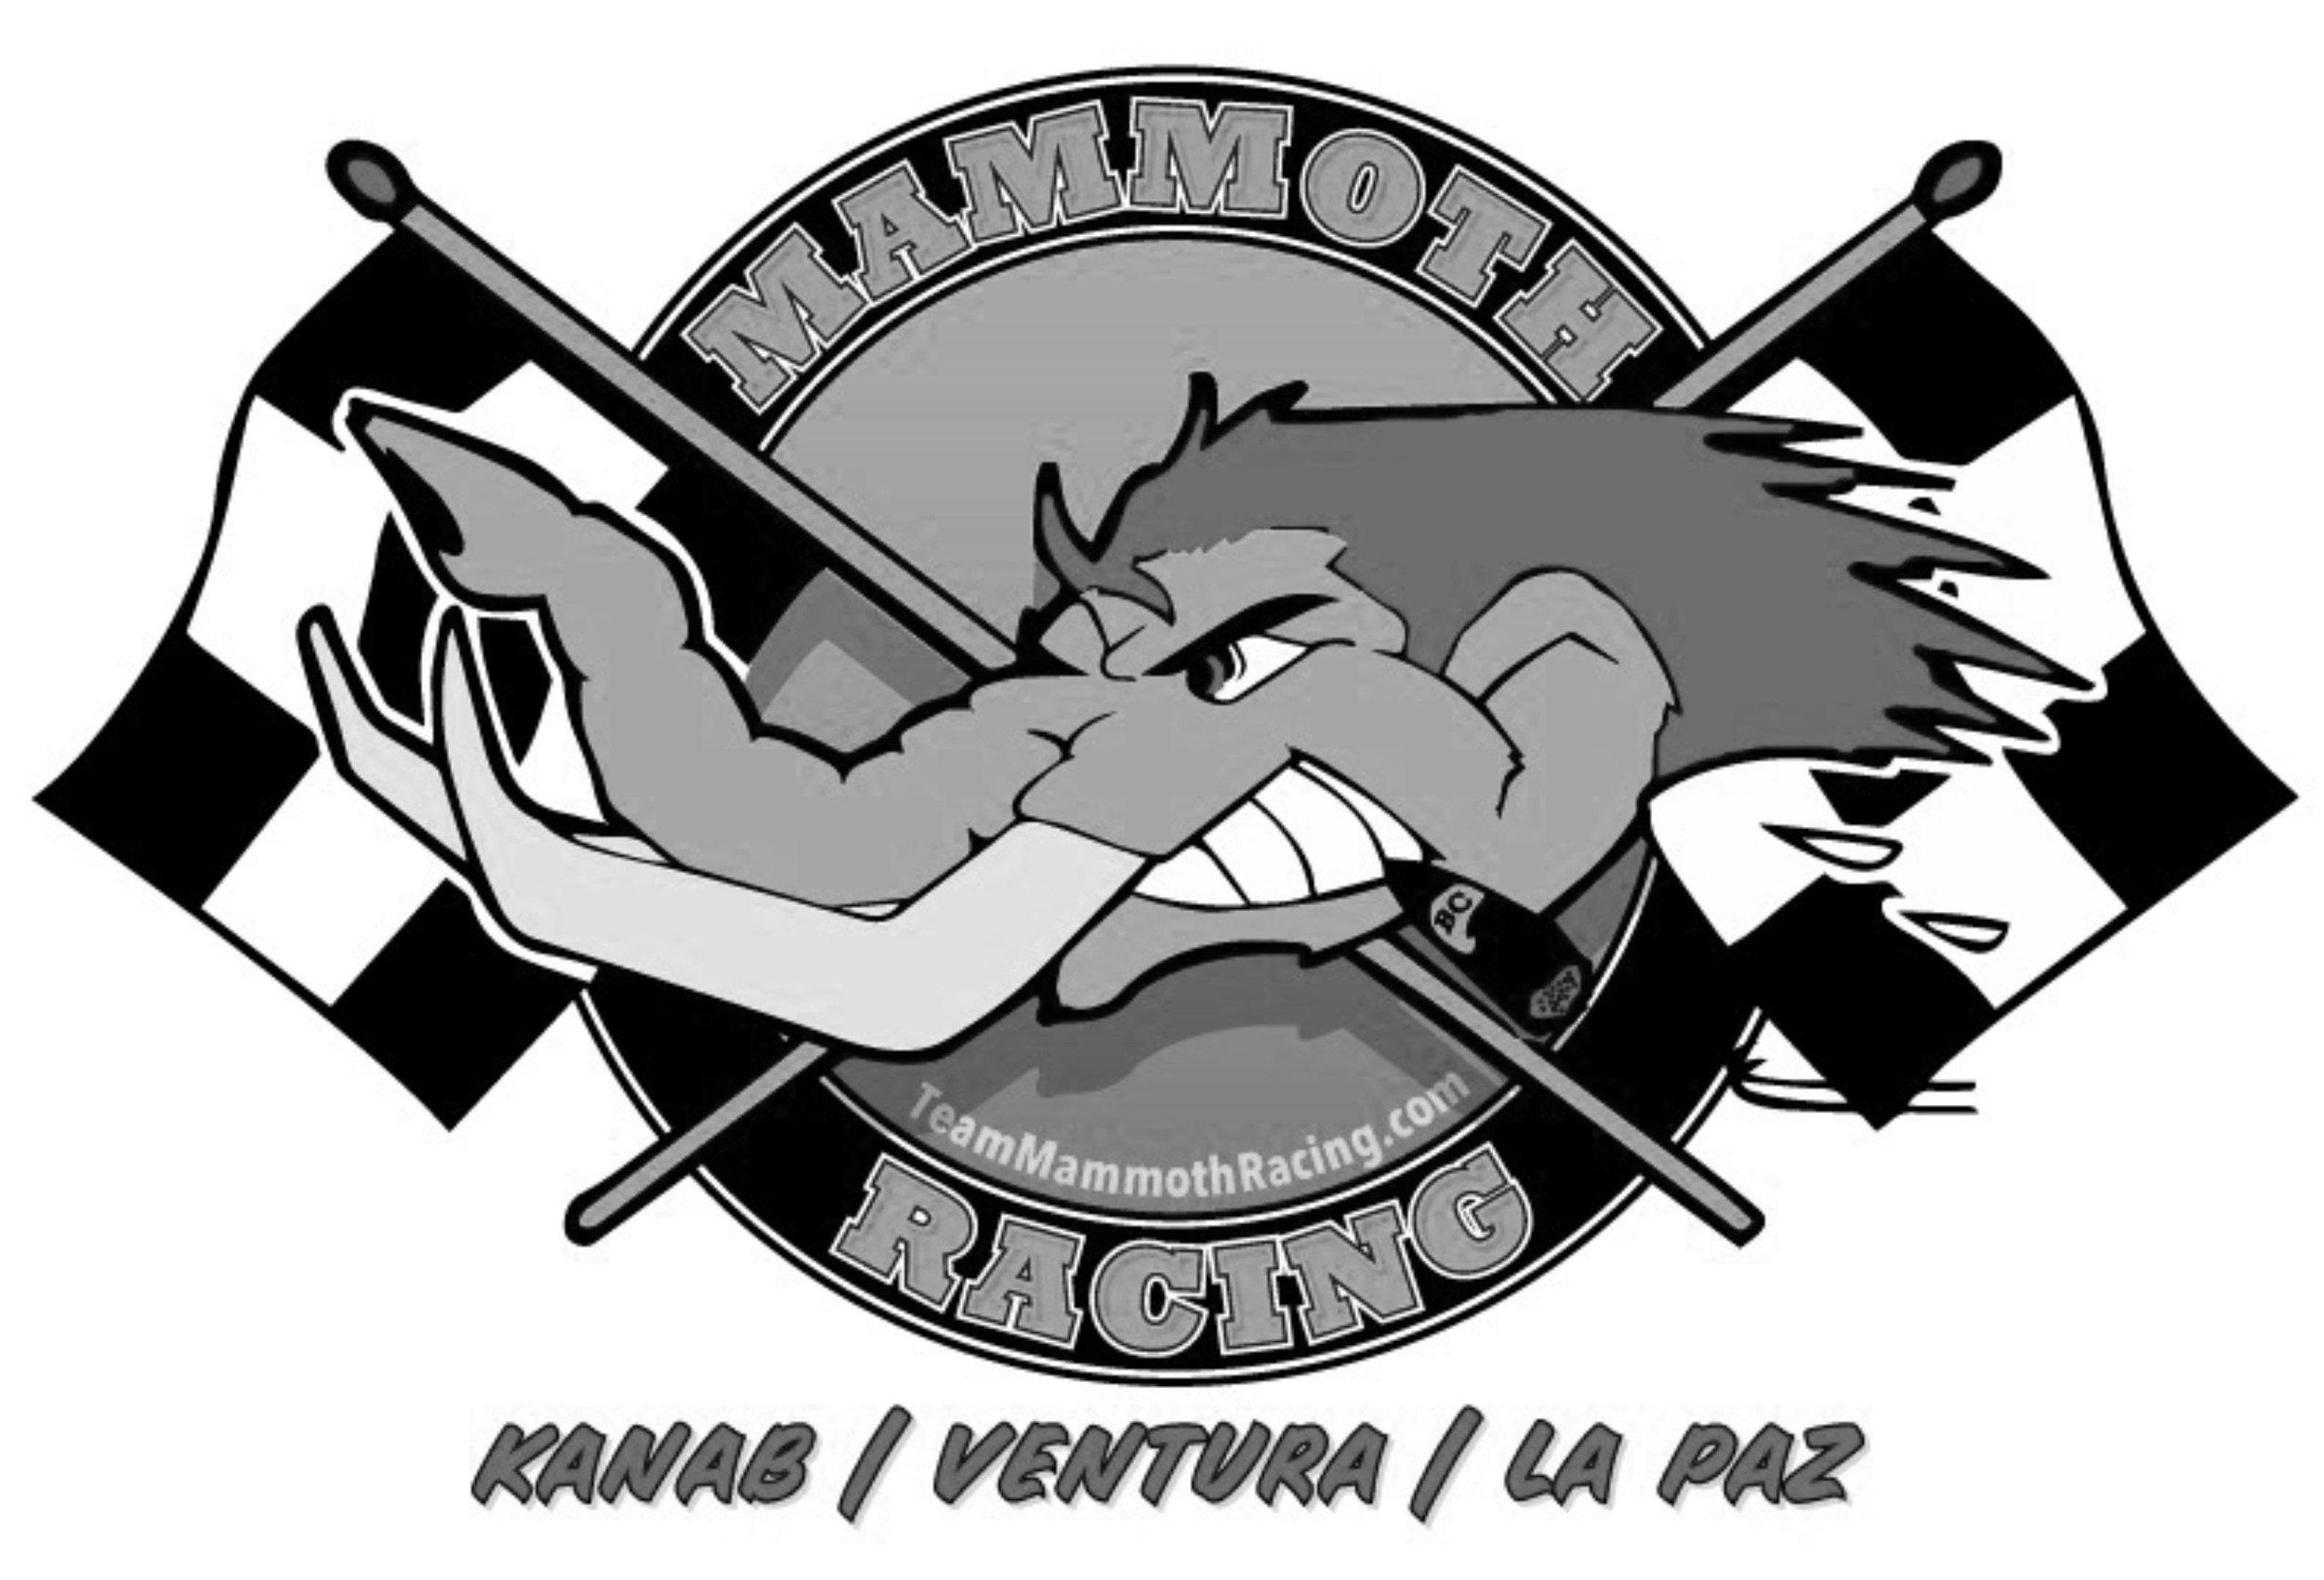 team mammoth racing.jpg